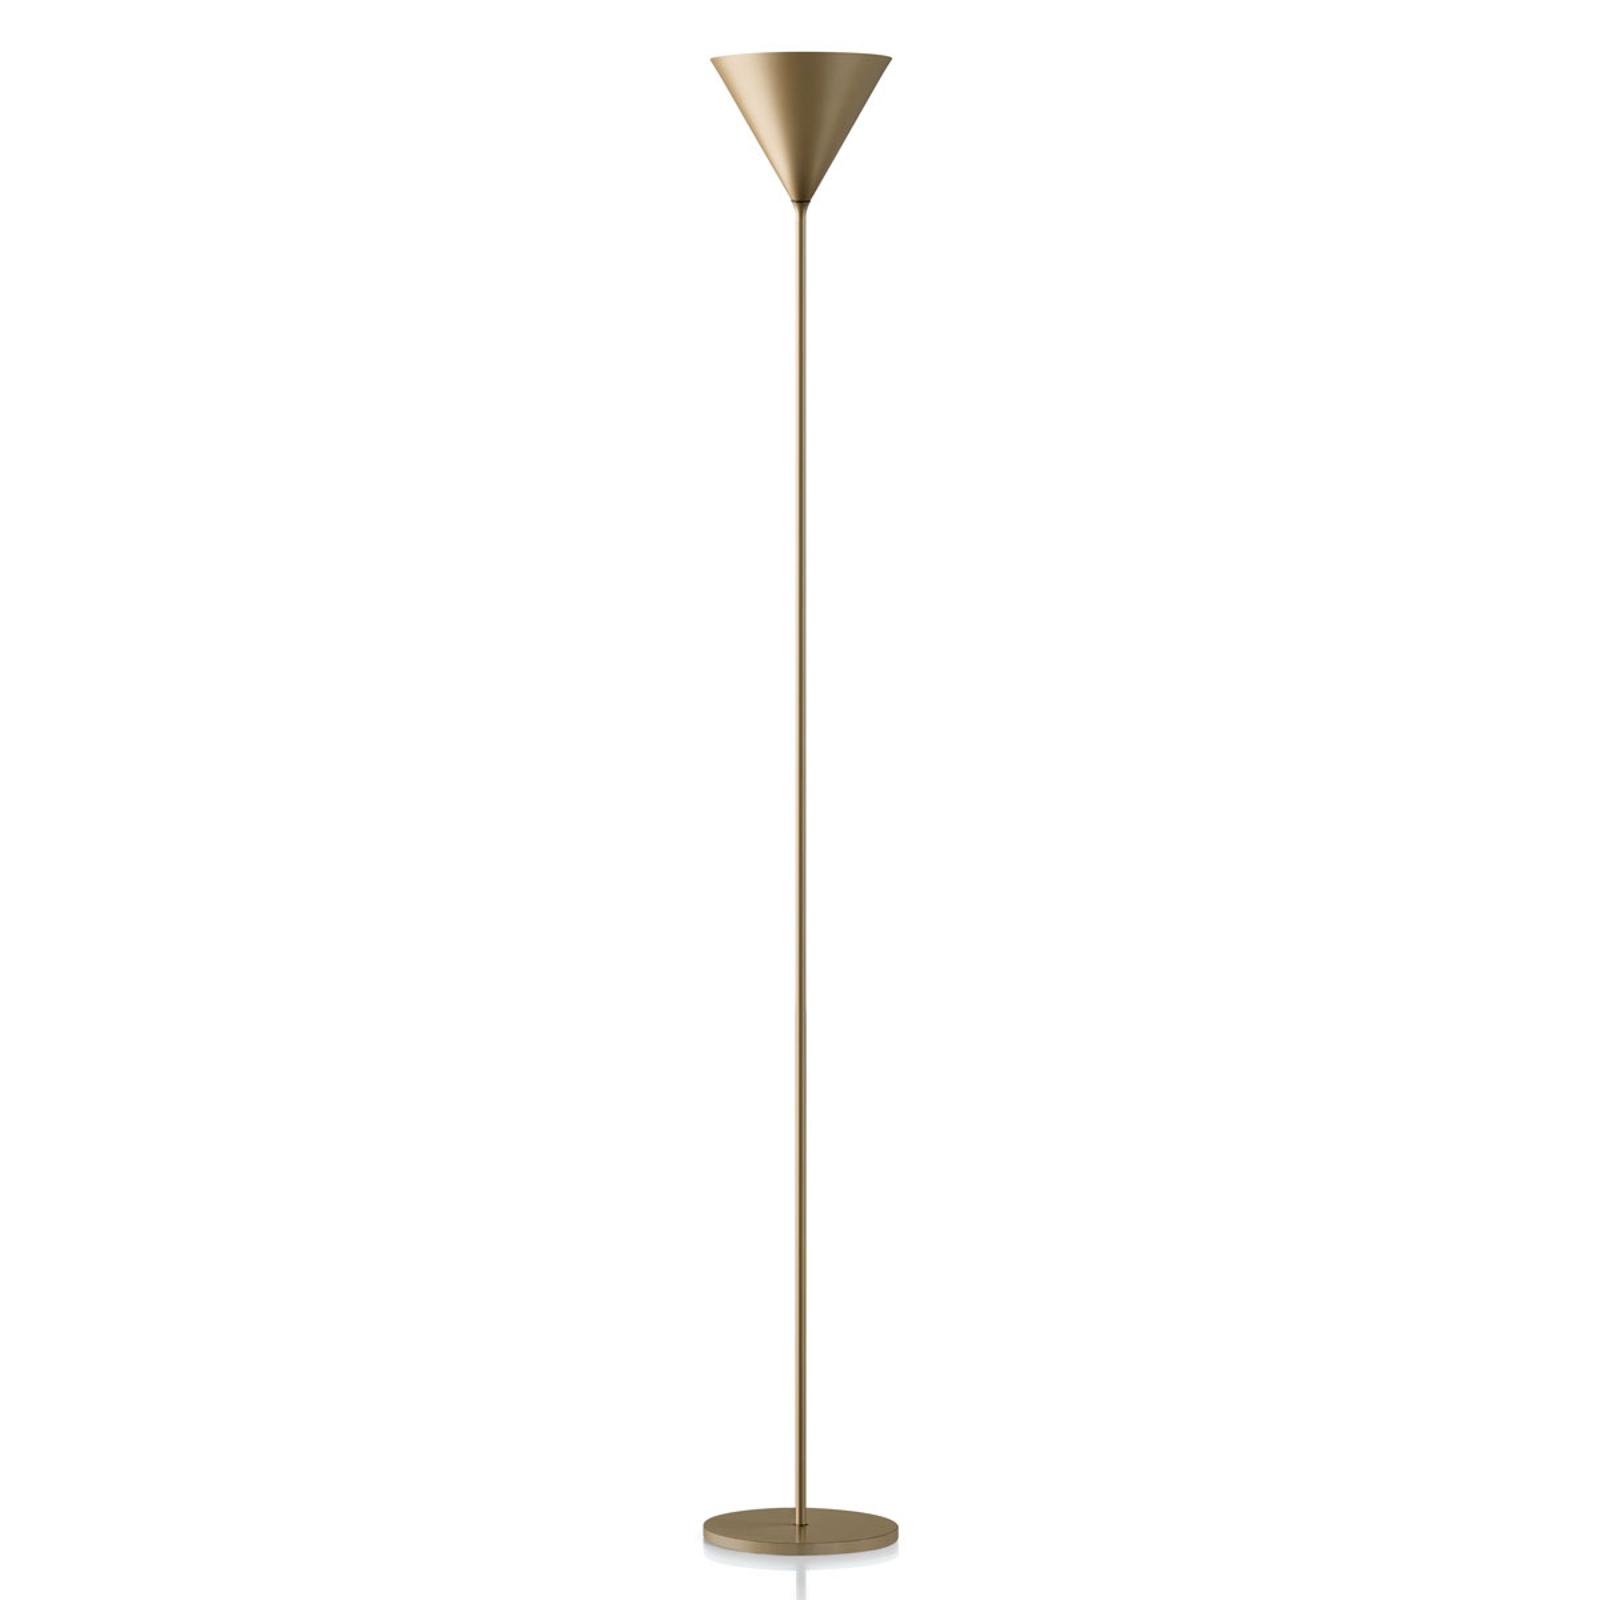 Modo Luce ABC Single lampadaire doré mat